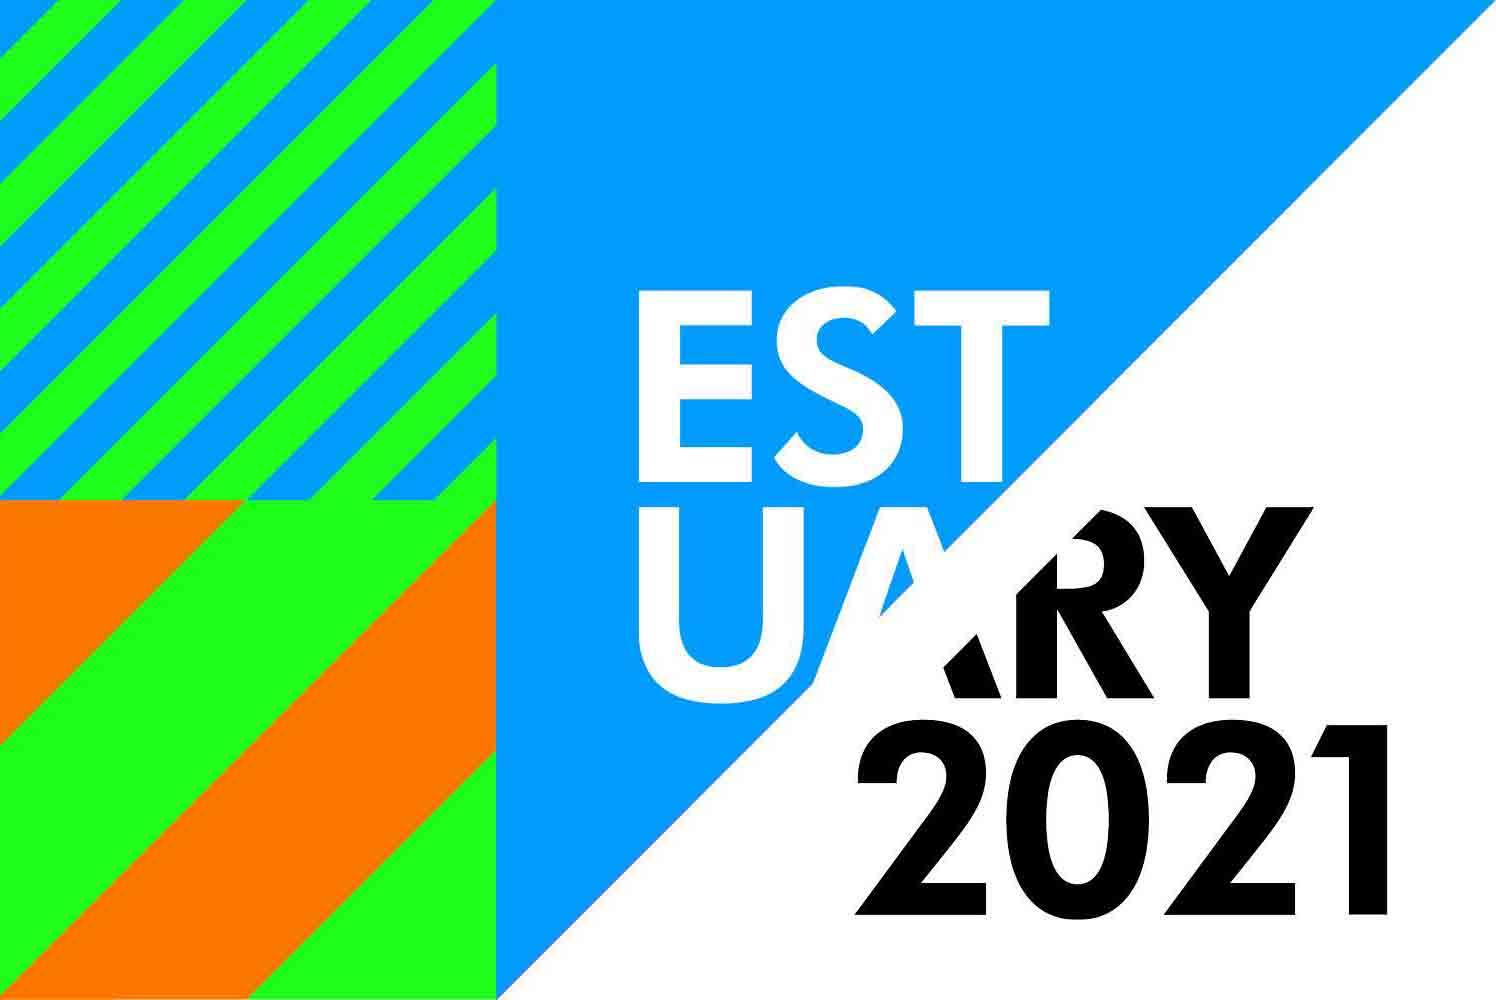 Estuary 2021 graphic banner artwork